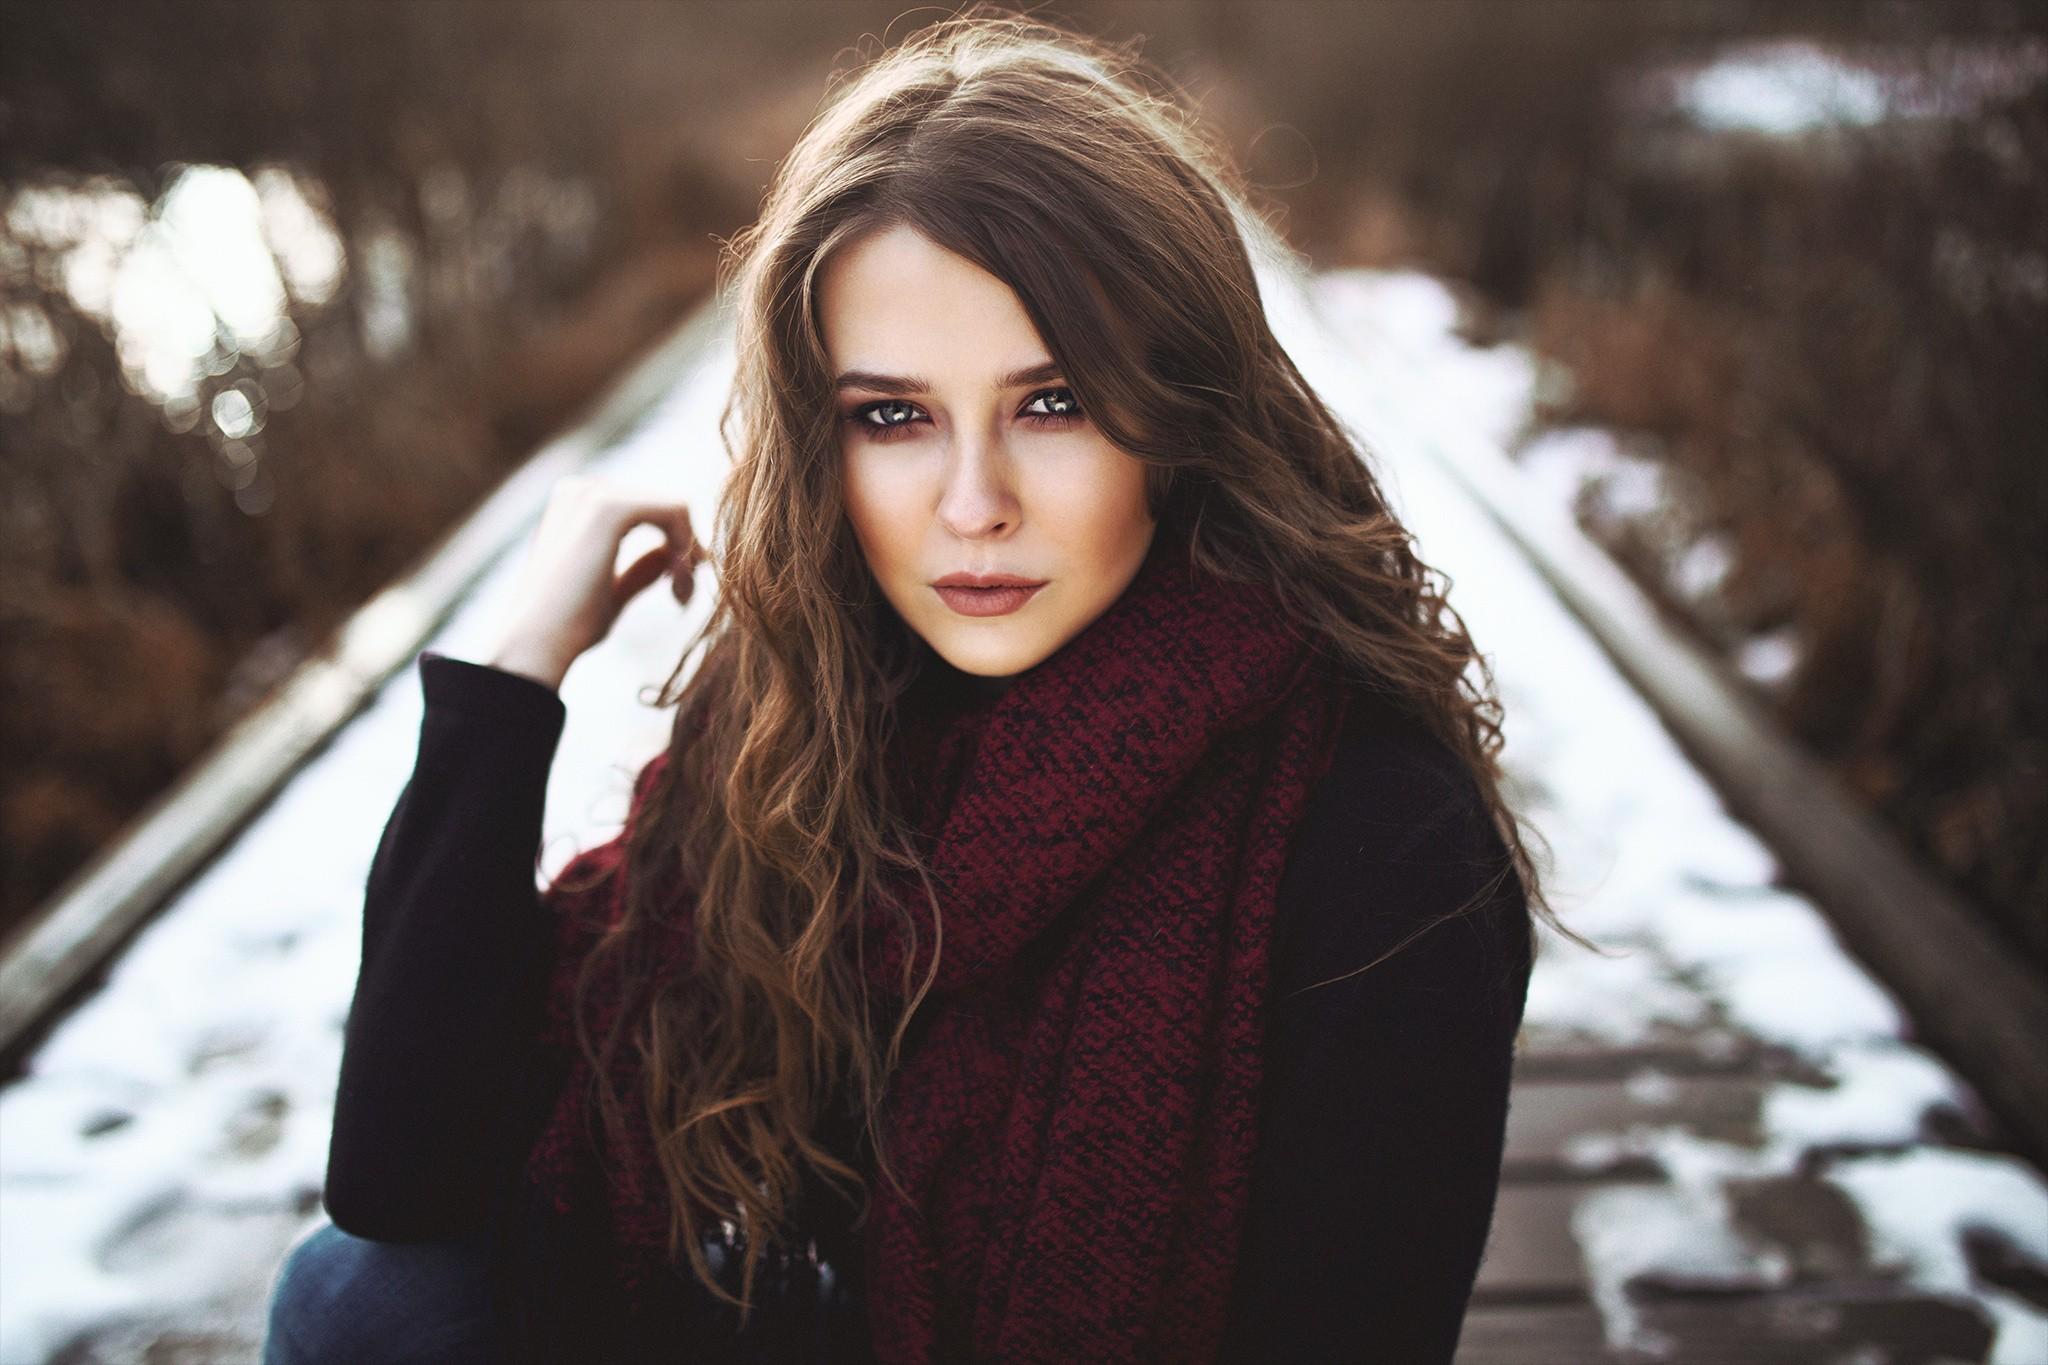 Wallpaper : women outdoors, long hair, blue eyes, brunette